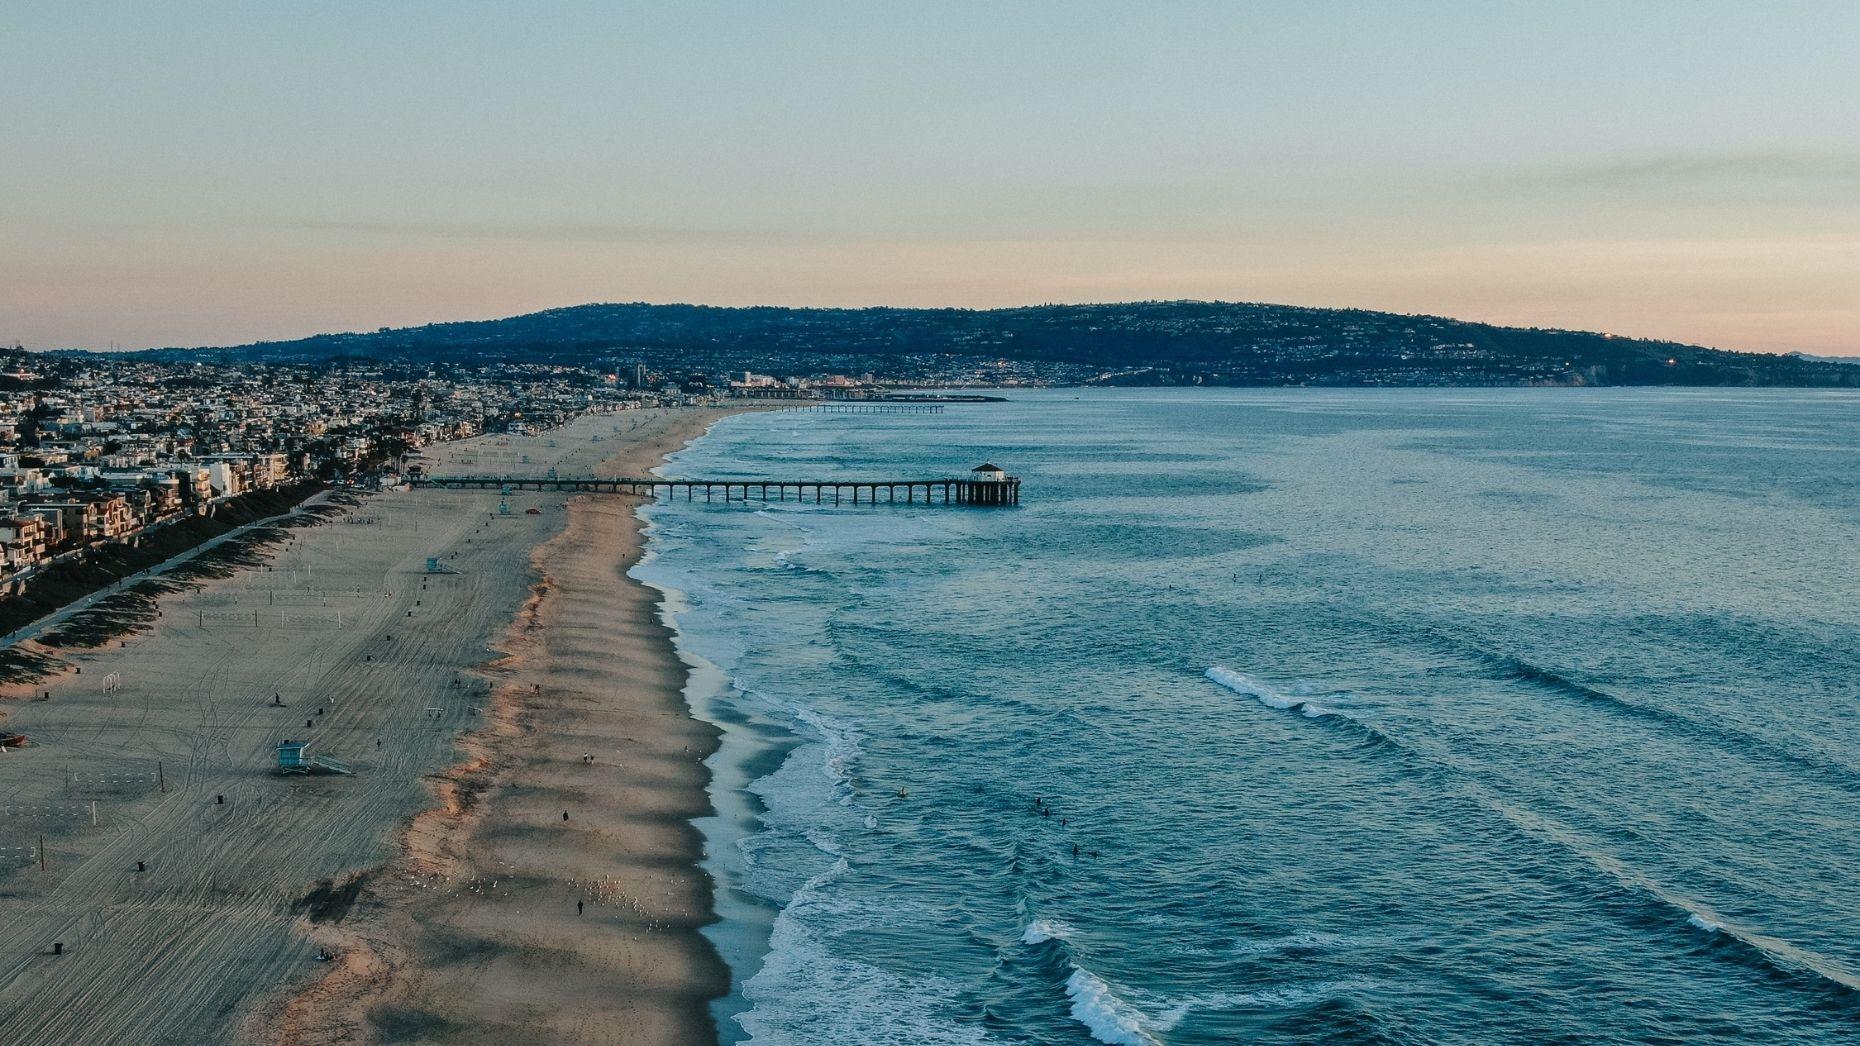 Corcoran Global Living adds 400 new associates across Southern California